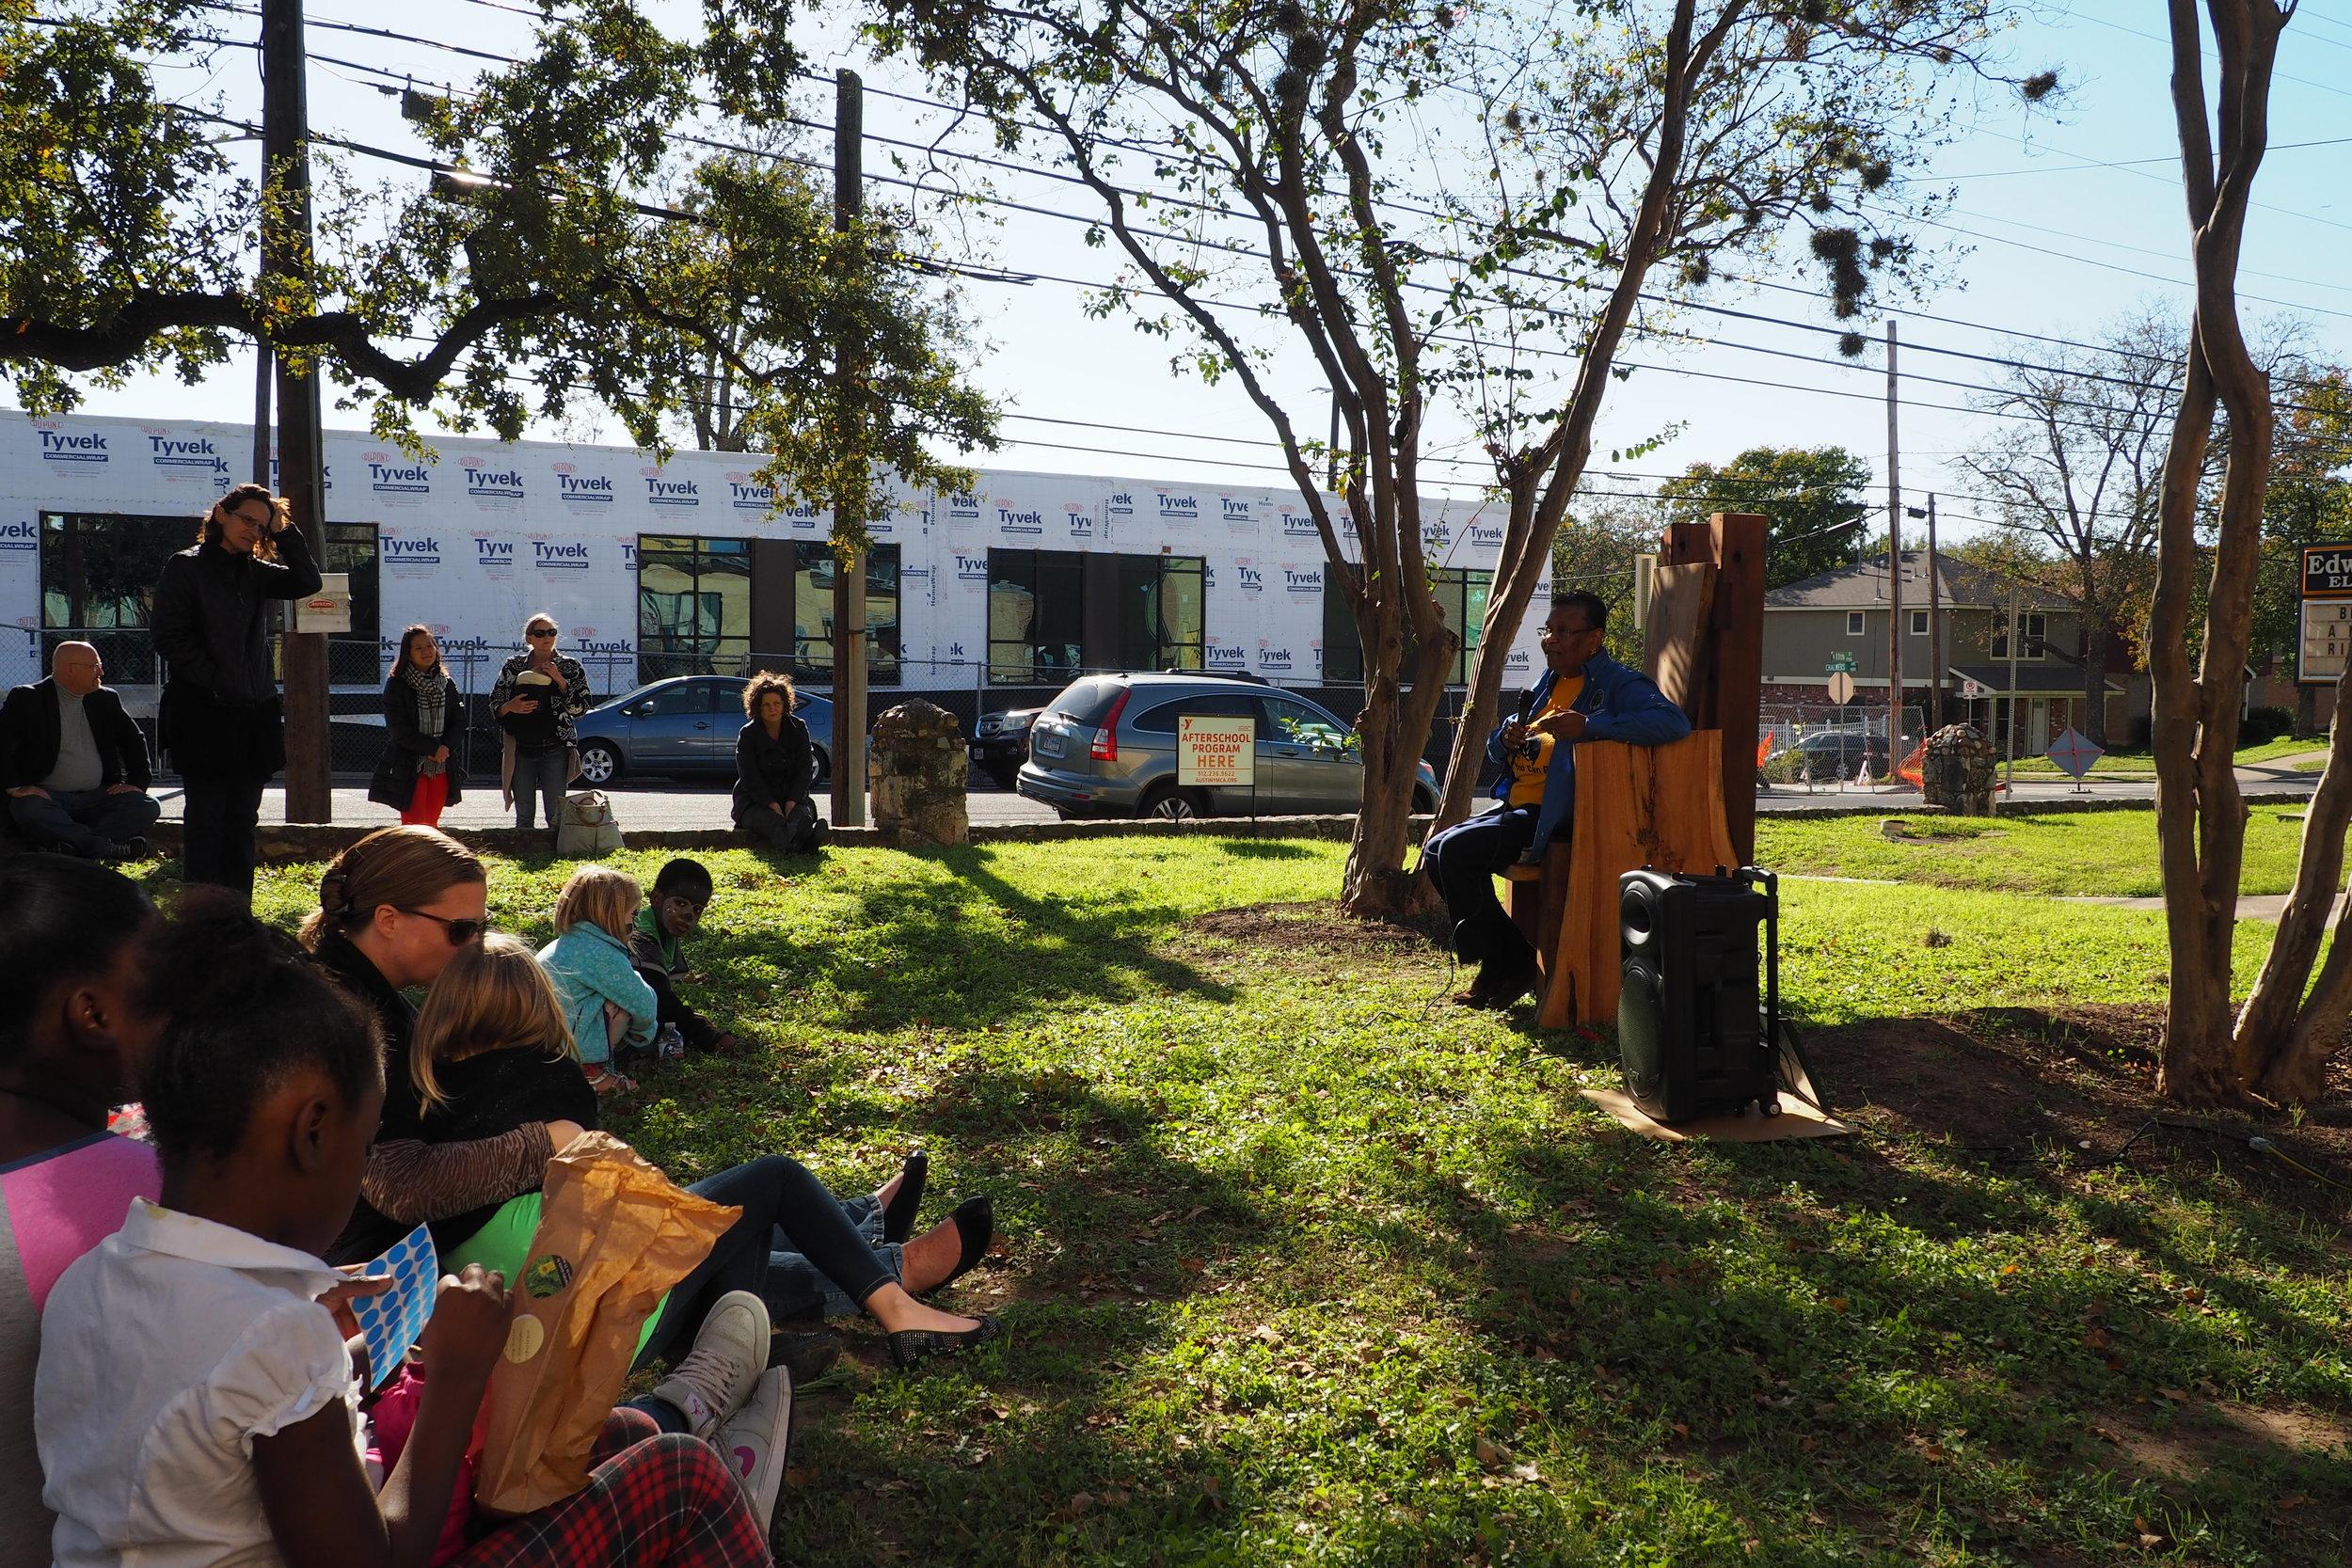 Ms. Rice, daughter of former Blackshear Principal Friendly Rice and Blackshear alumna, shares stories of her memories of Blackshear during the inaugural reading at Little East.